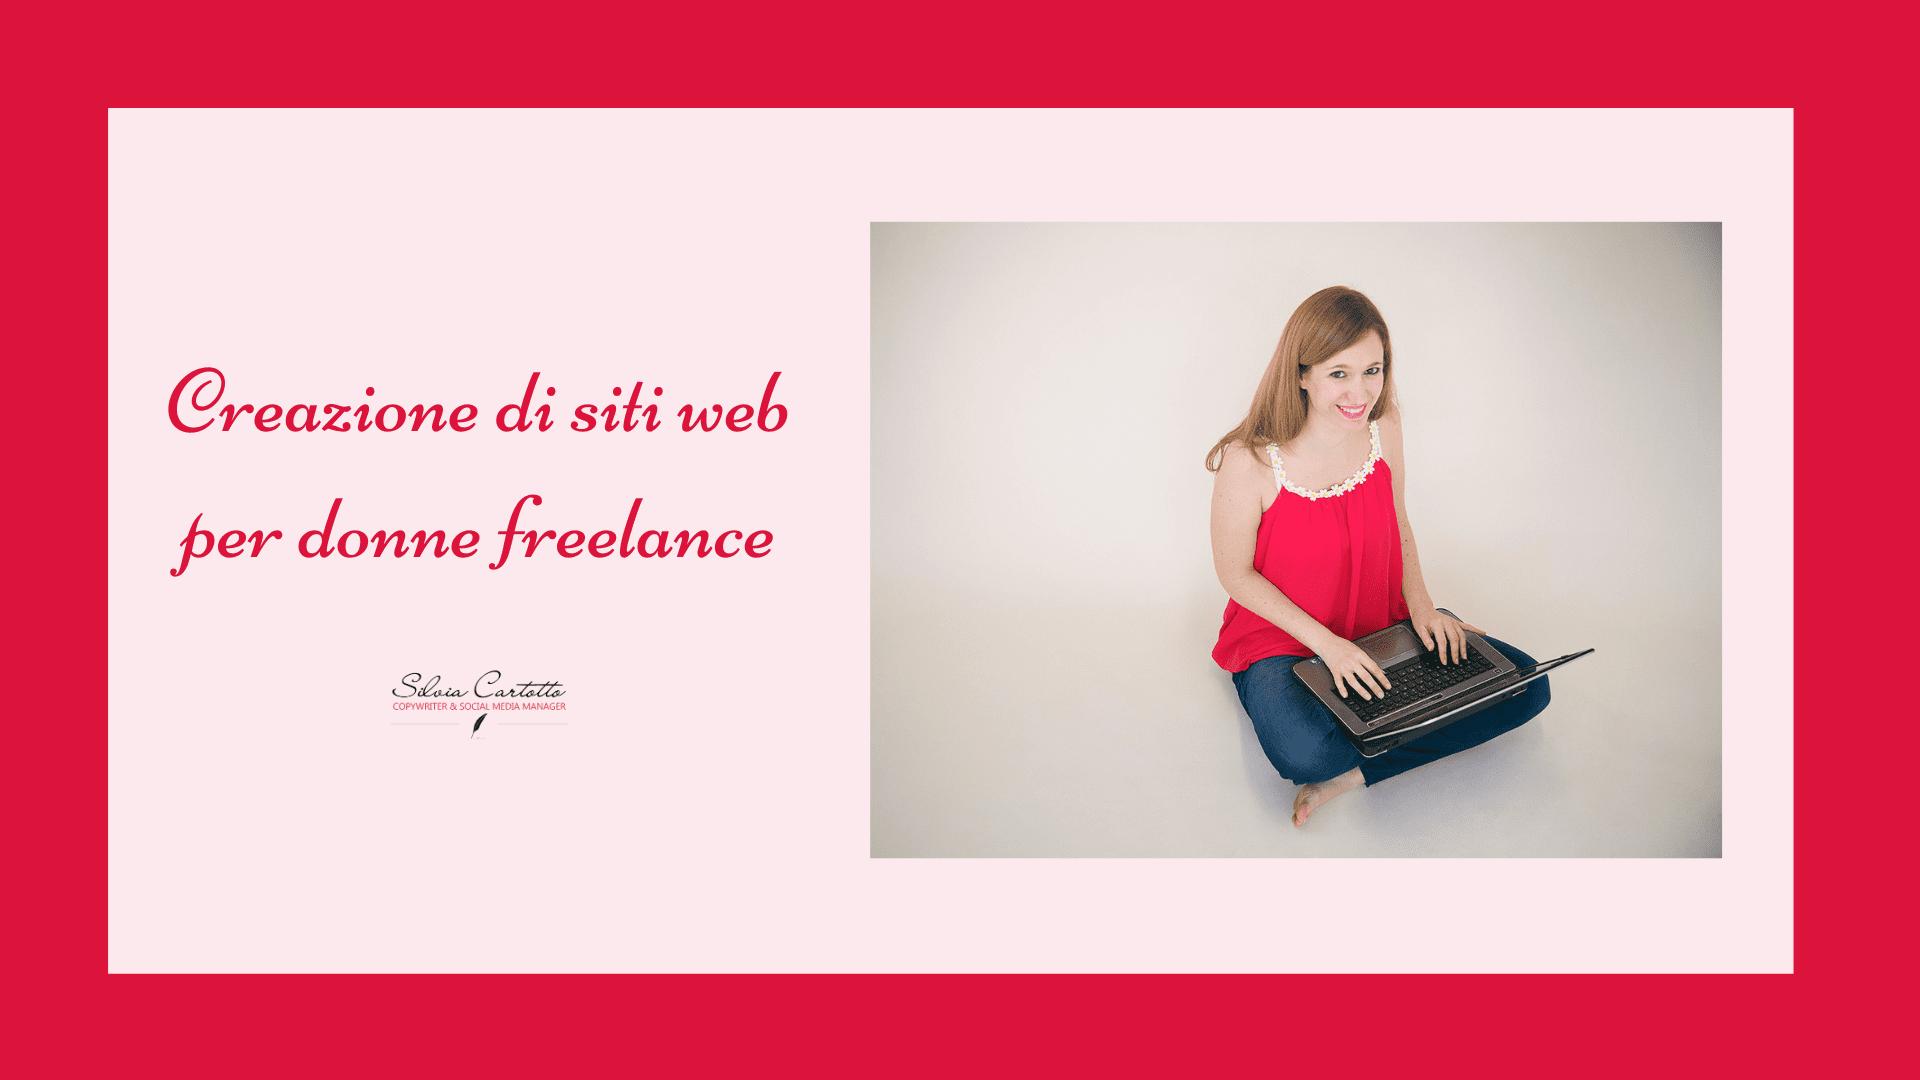 creazione siti web per donne freelance